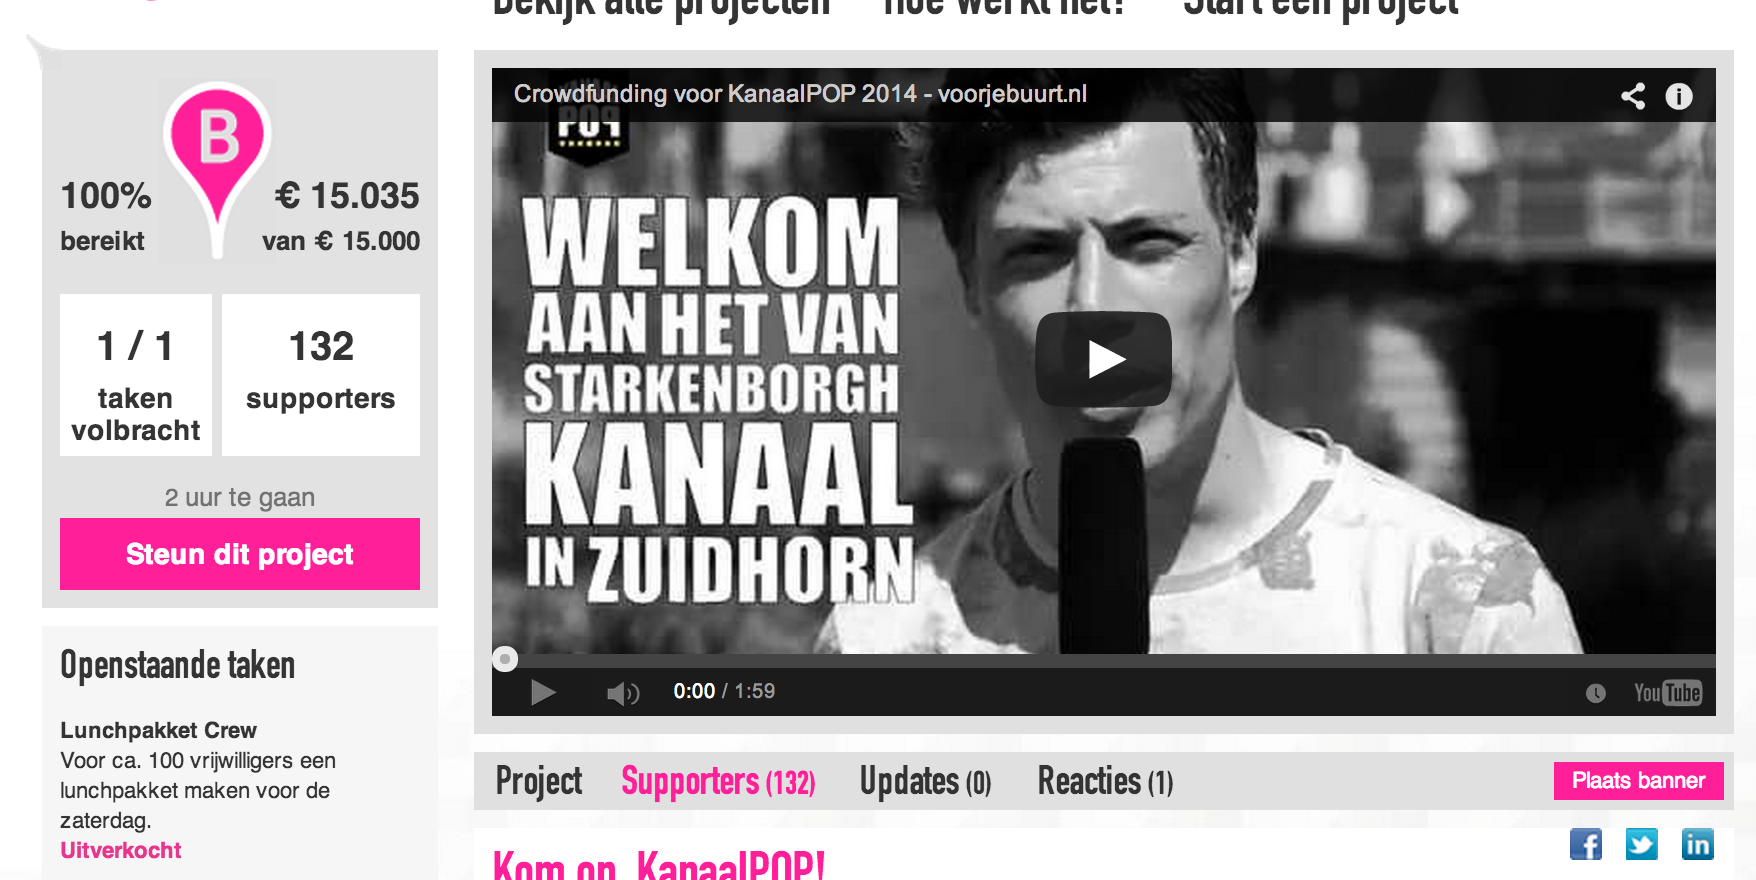 kanaalpop crowdfunding